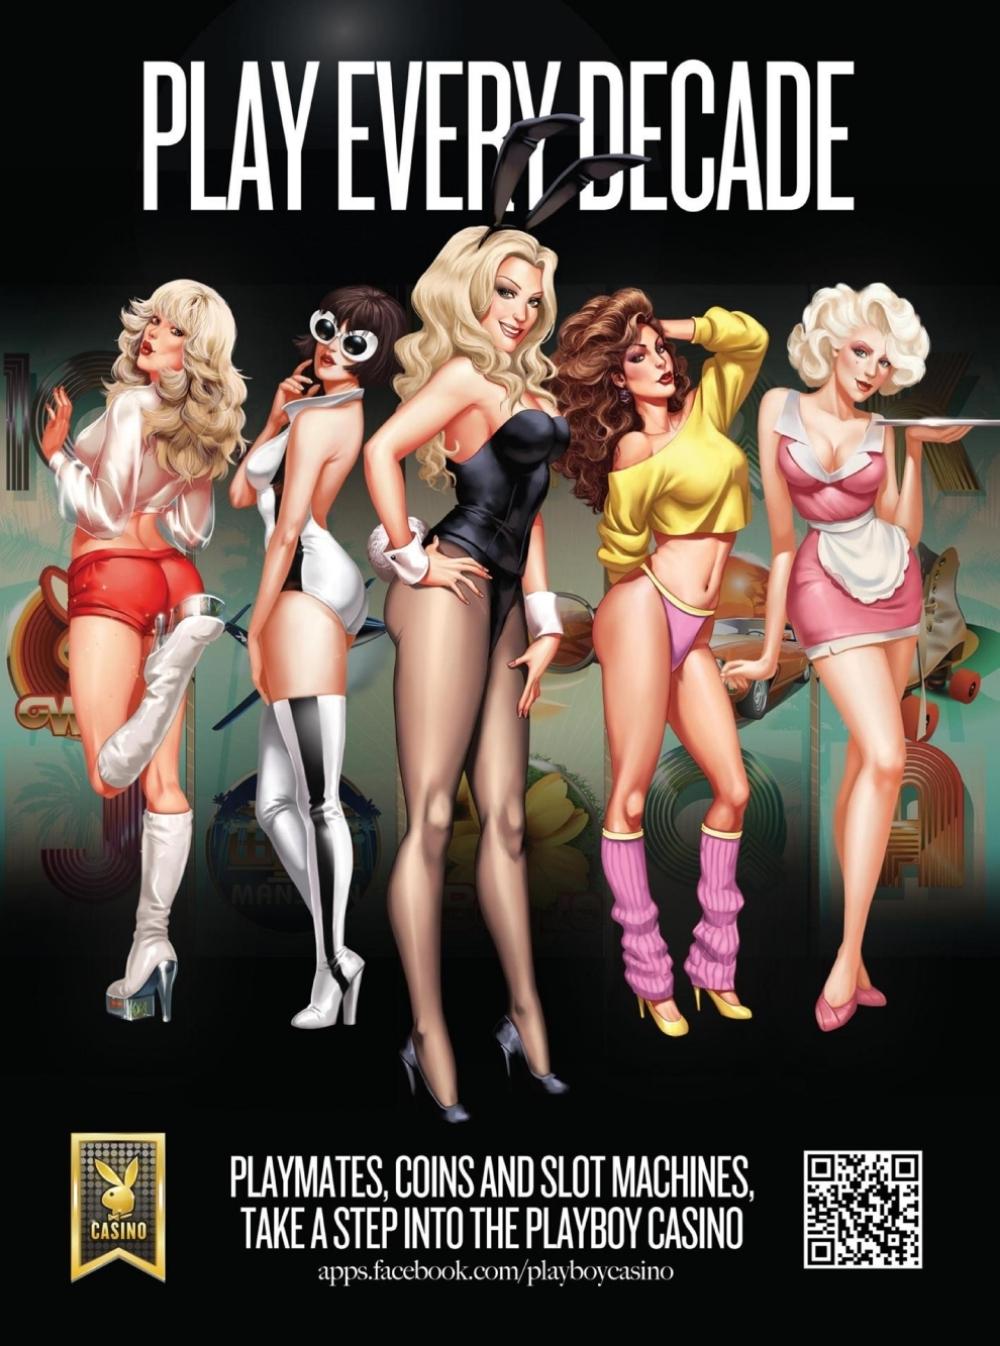 Playboy #9 (September. 2014.USA) PDF